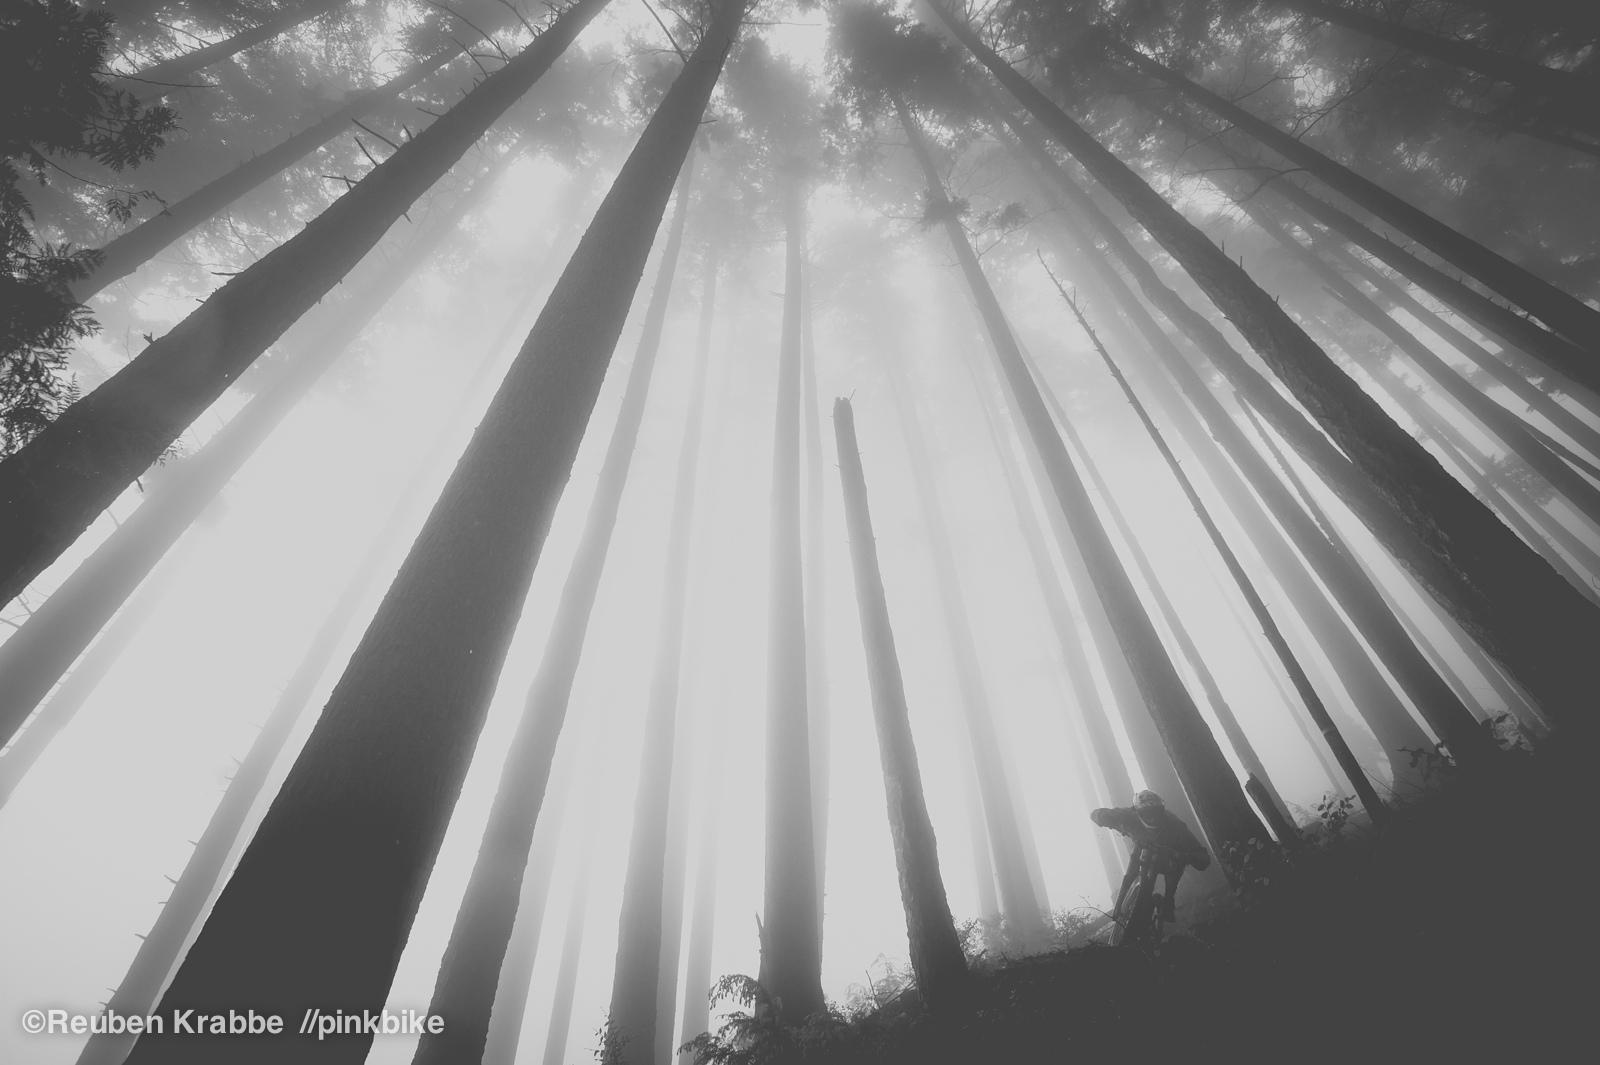 Stephen Matthews rides through foggy mordor like trees on sumas